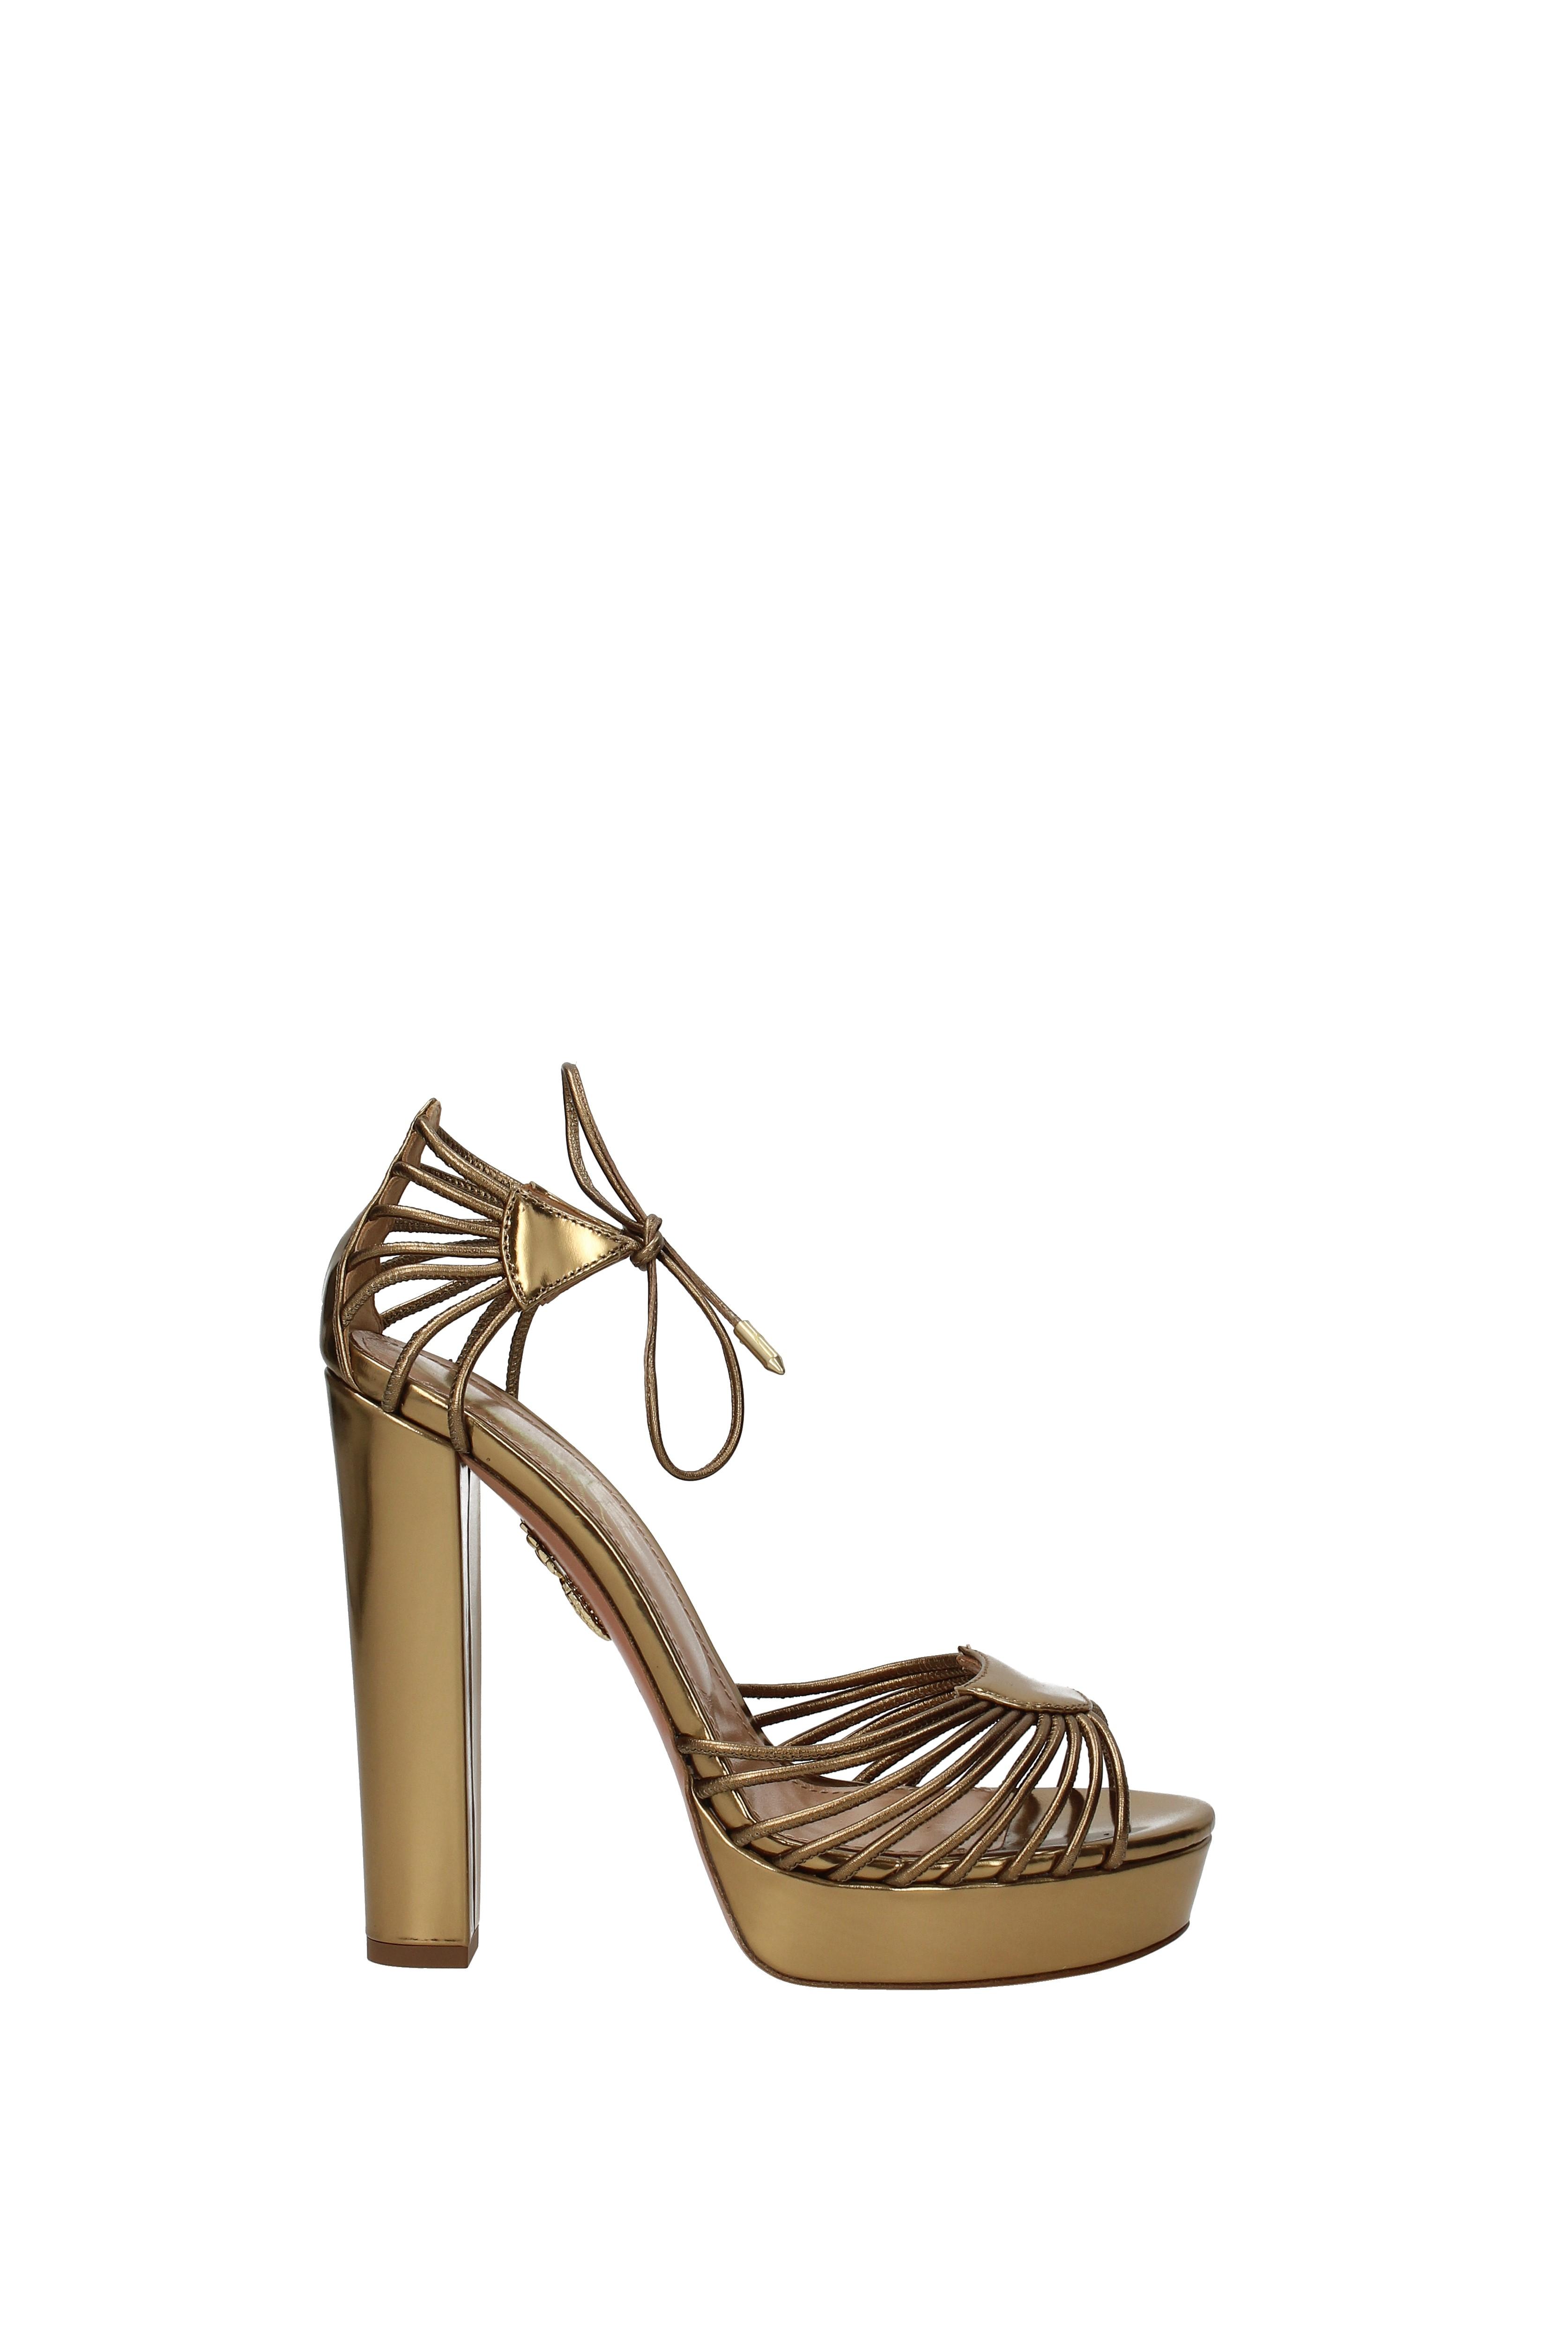 Sandals Aquazzura josephine  Leder Women -  Leder  (JOSHIGB0SPL) 1f68a6